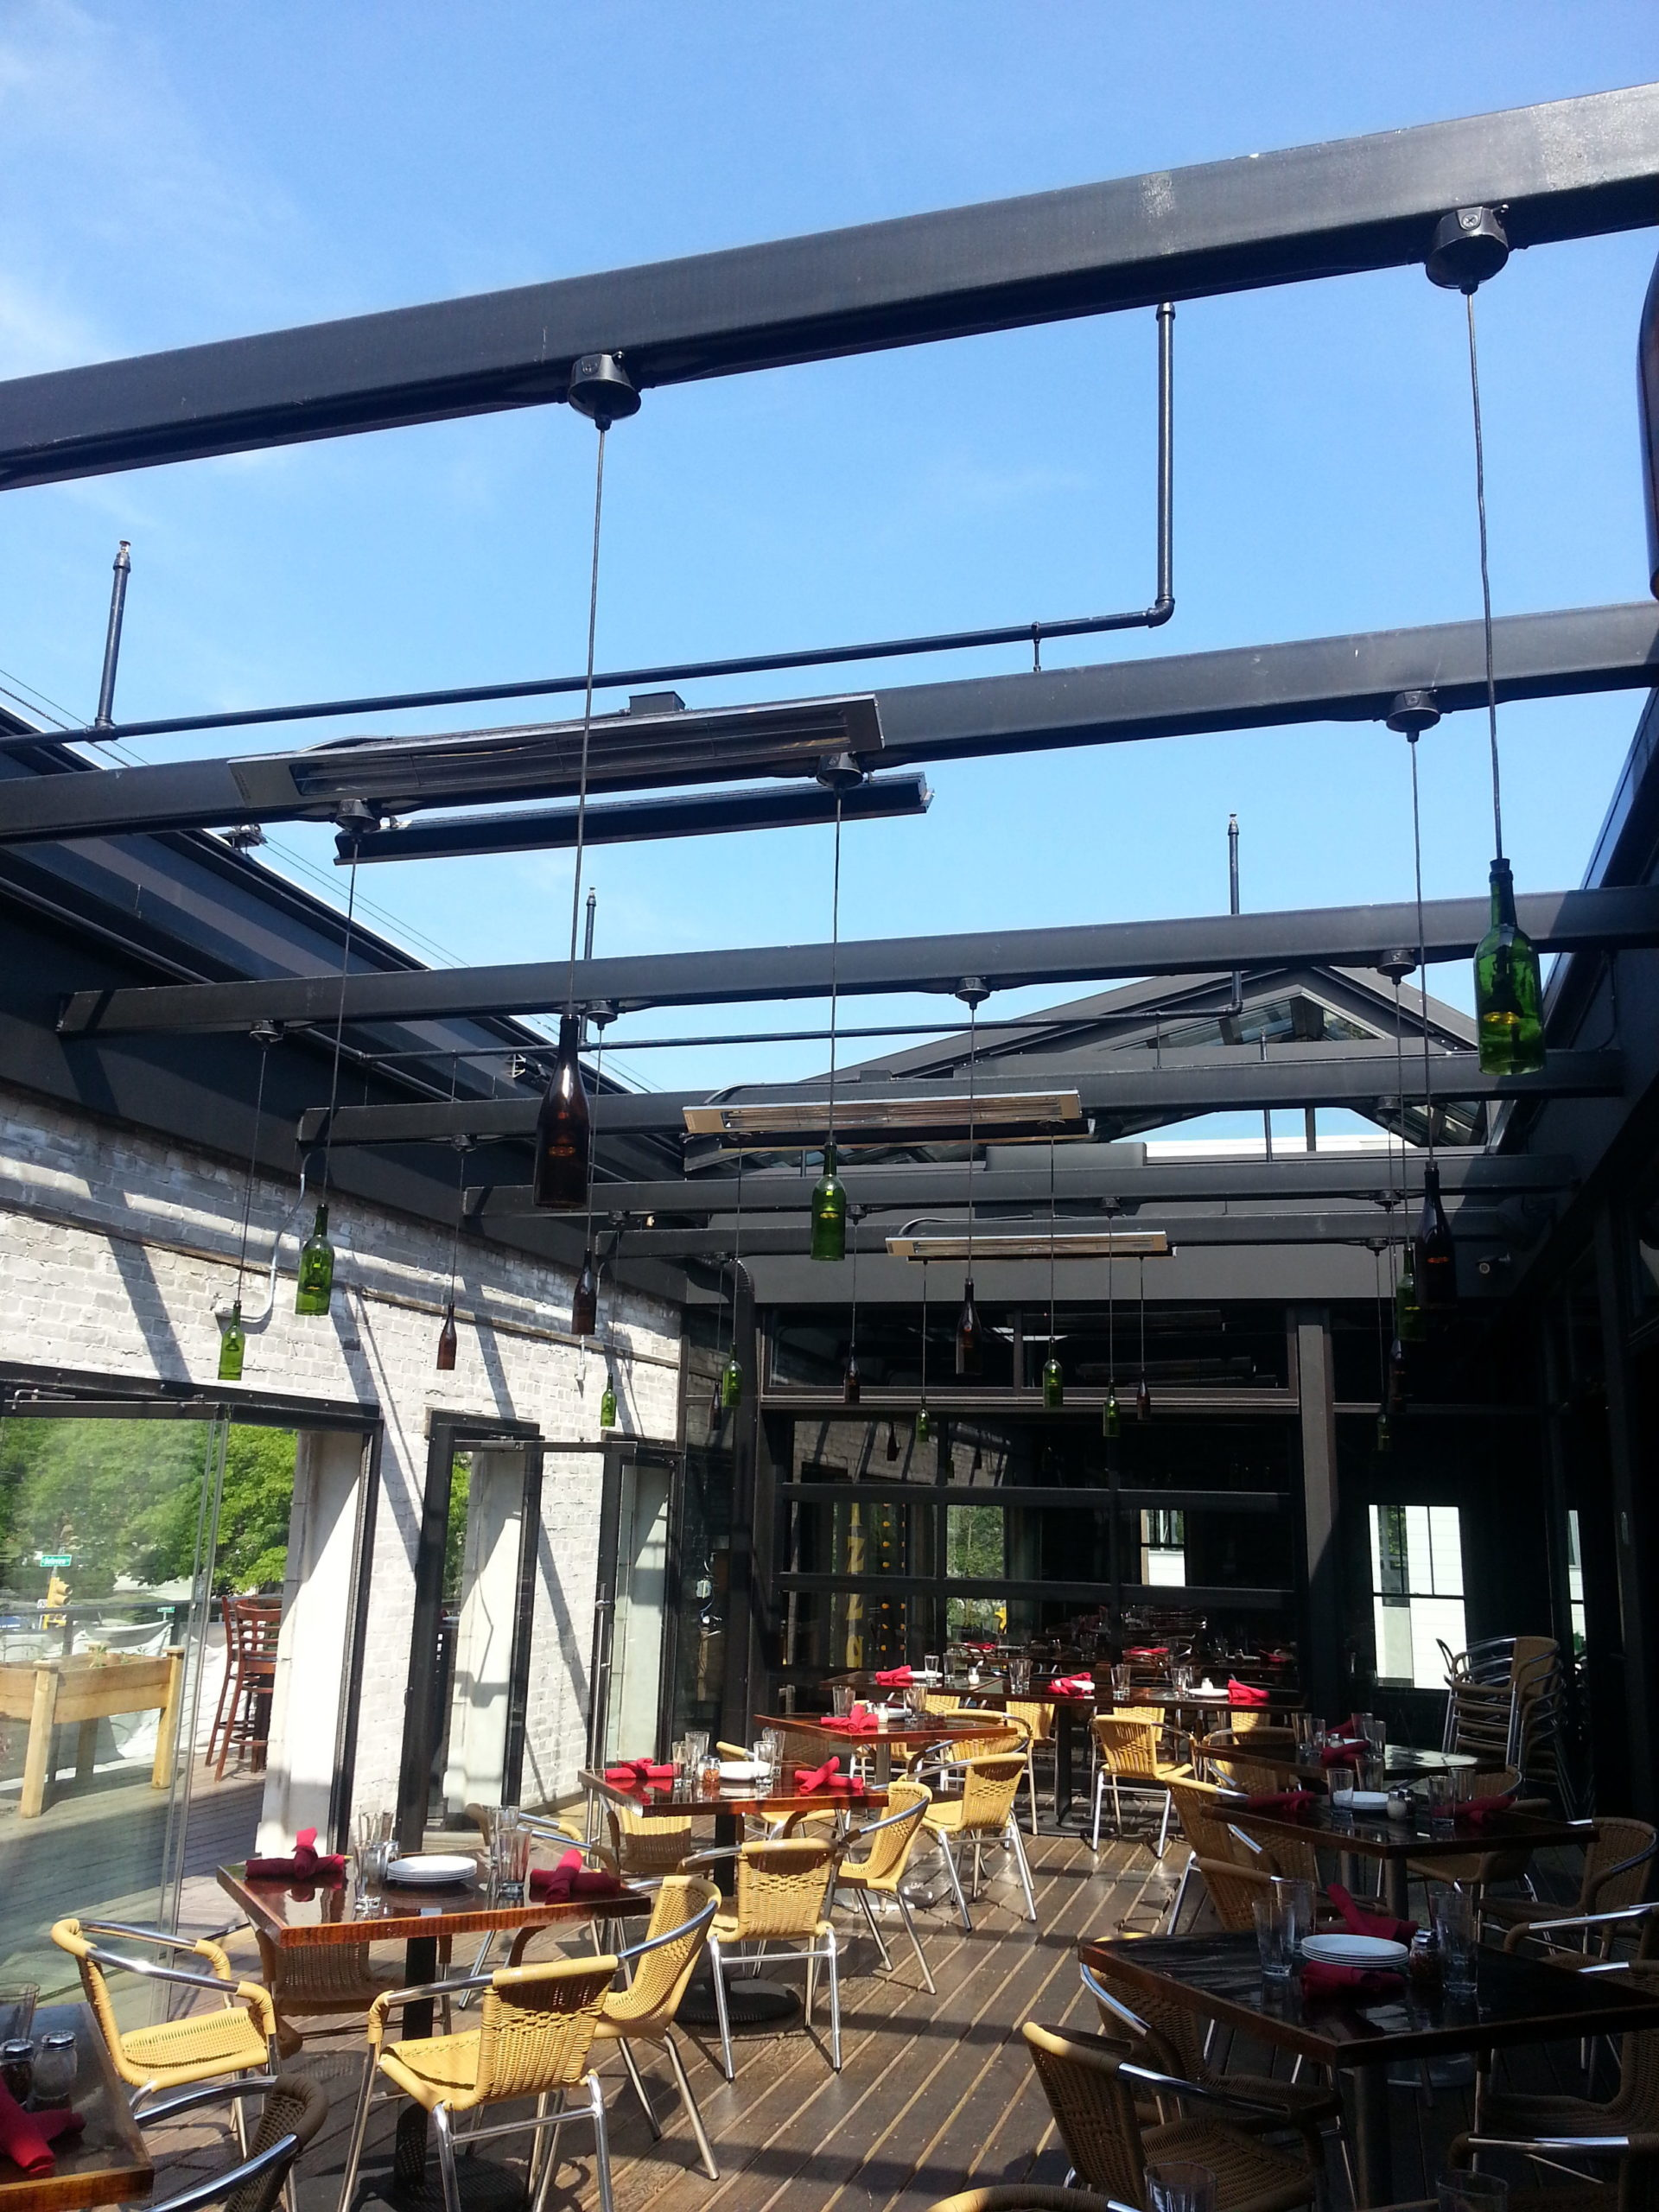 Retractable skylight at a restaurant